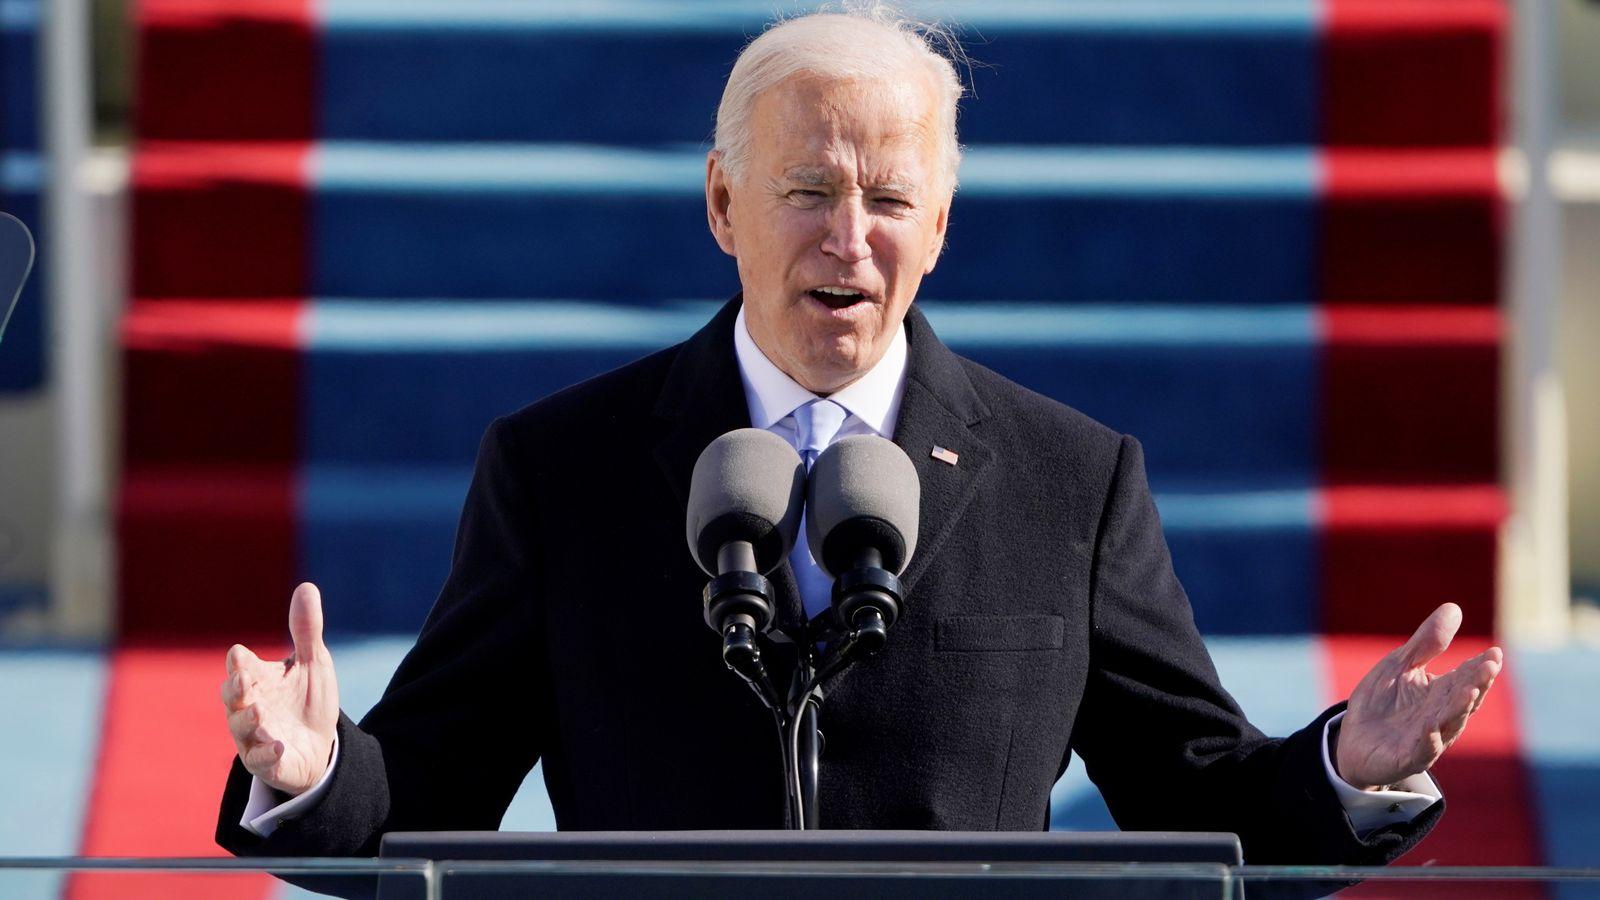 Joe Biden Sworn In As New US President As Trump Snubs Ceremony